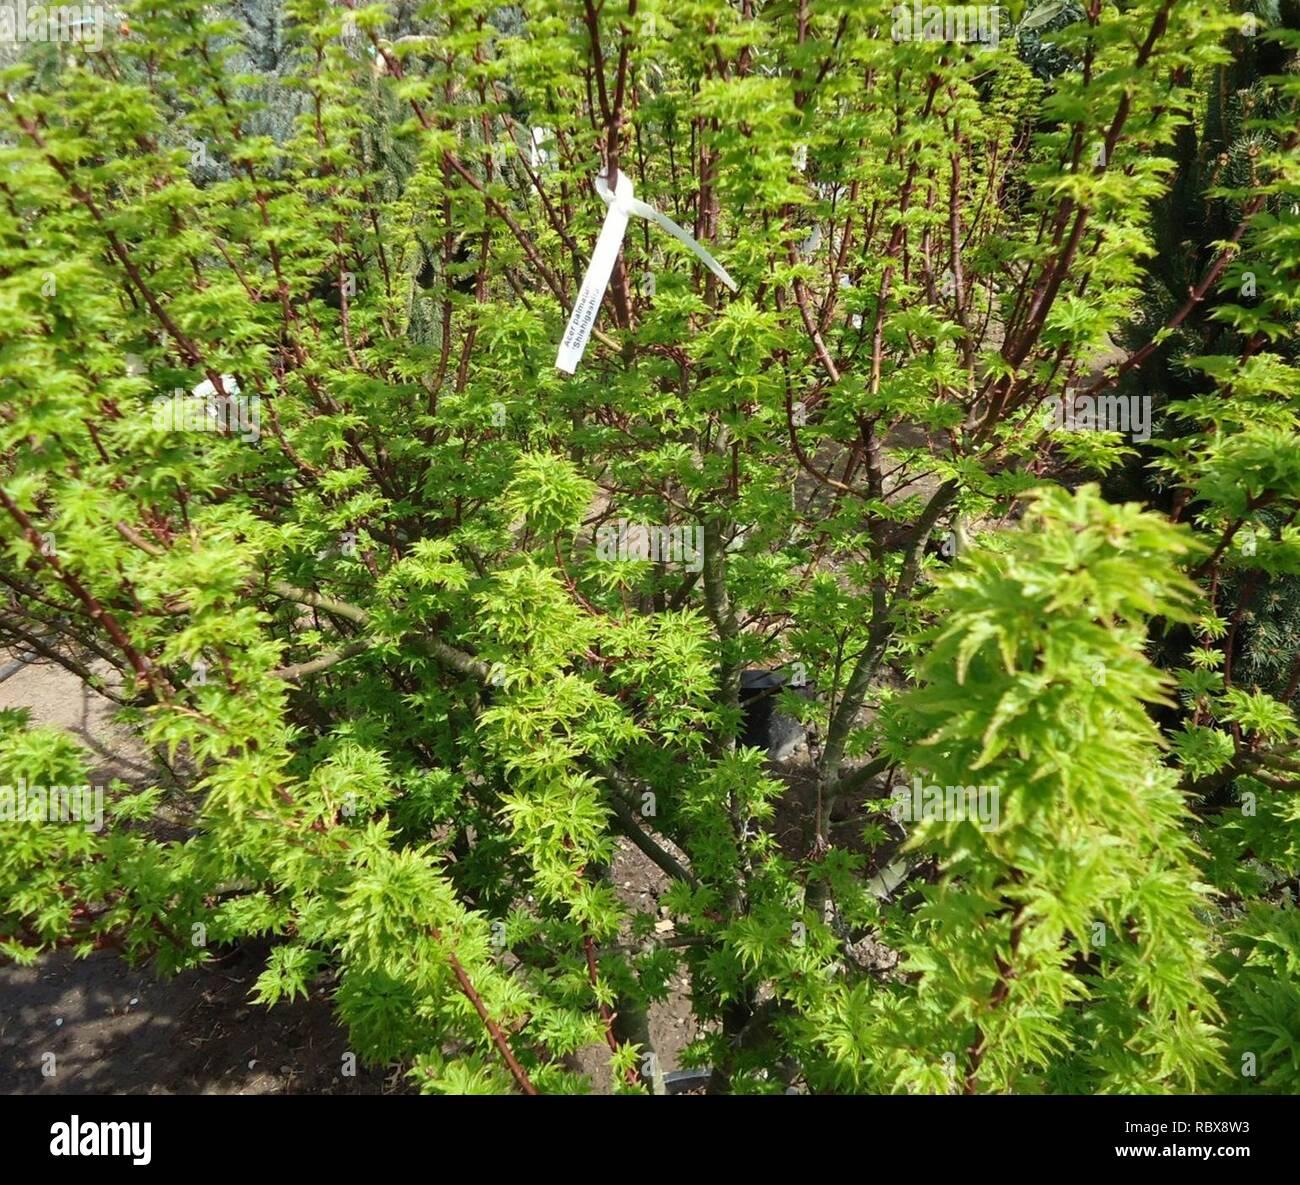 Acer palmatum 'Shishigashira' plants growing in NJ in April wideshot. - Stock Image